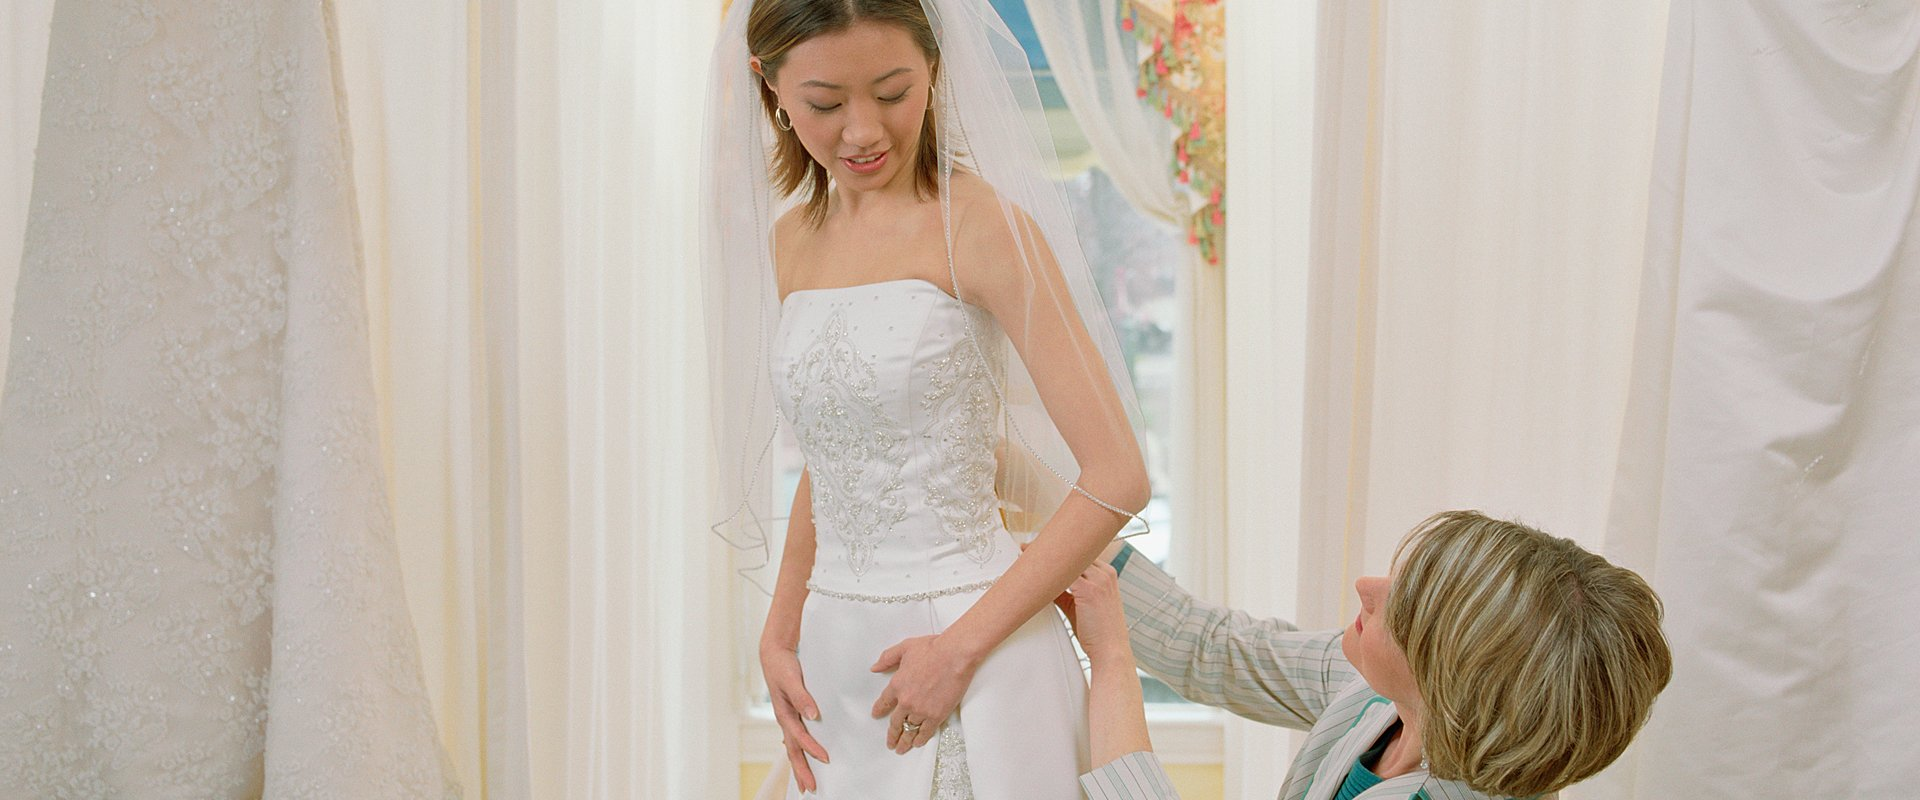 Wedding dress cleaning fargo nd mini bridal for Wedding dresses fargo nd